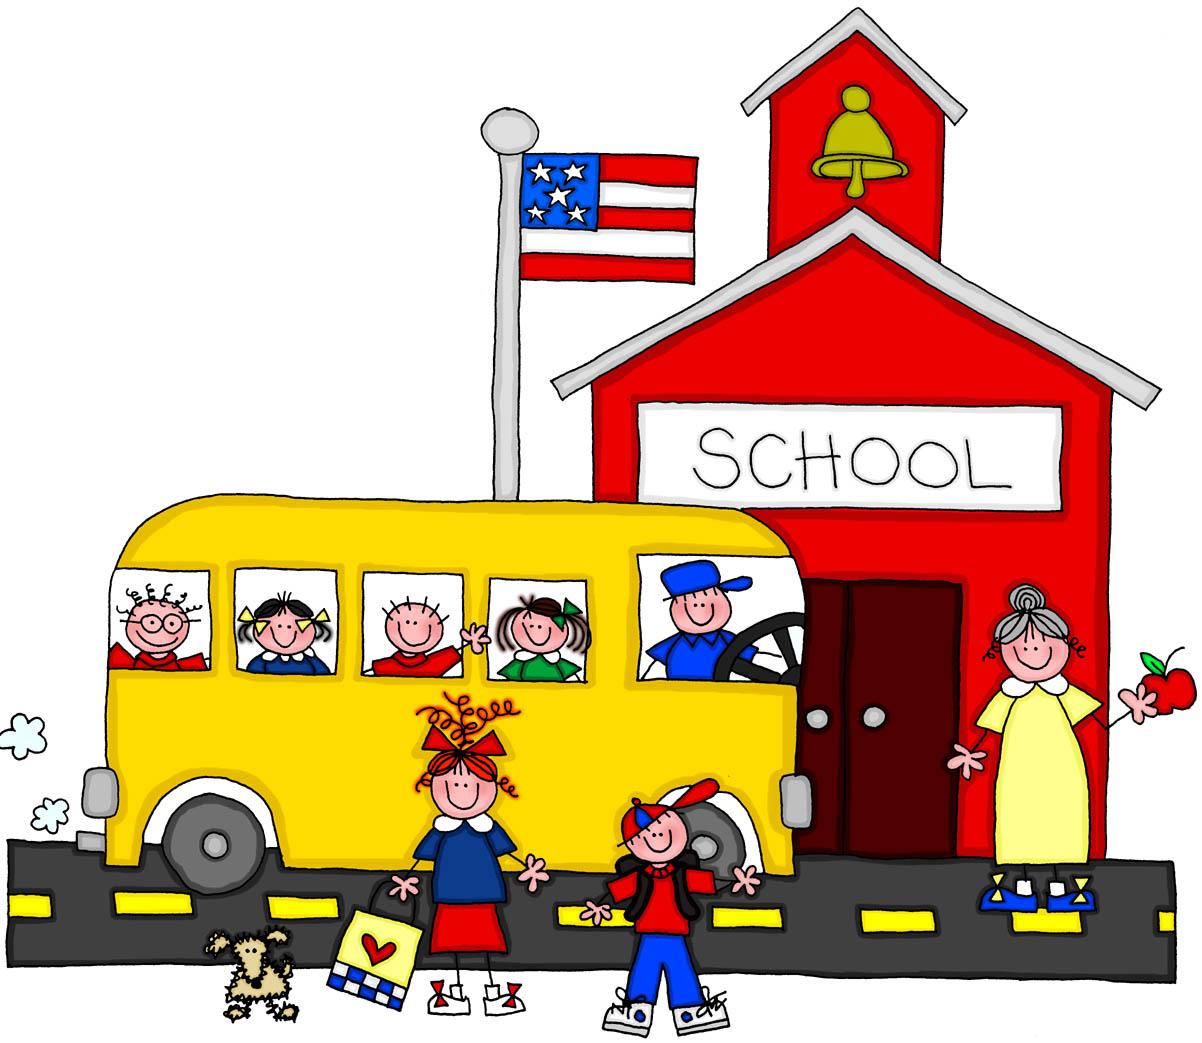 Fall Schoolhouse Wallpaper Free Cartoon School Building Download Free Clip Art Free